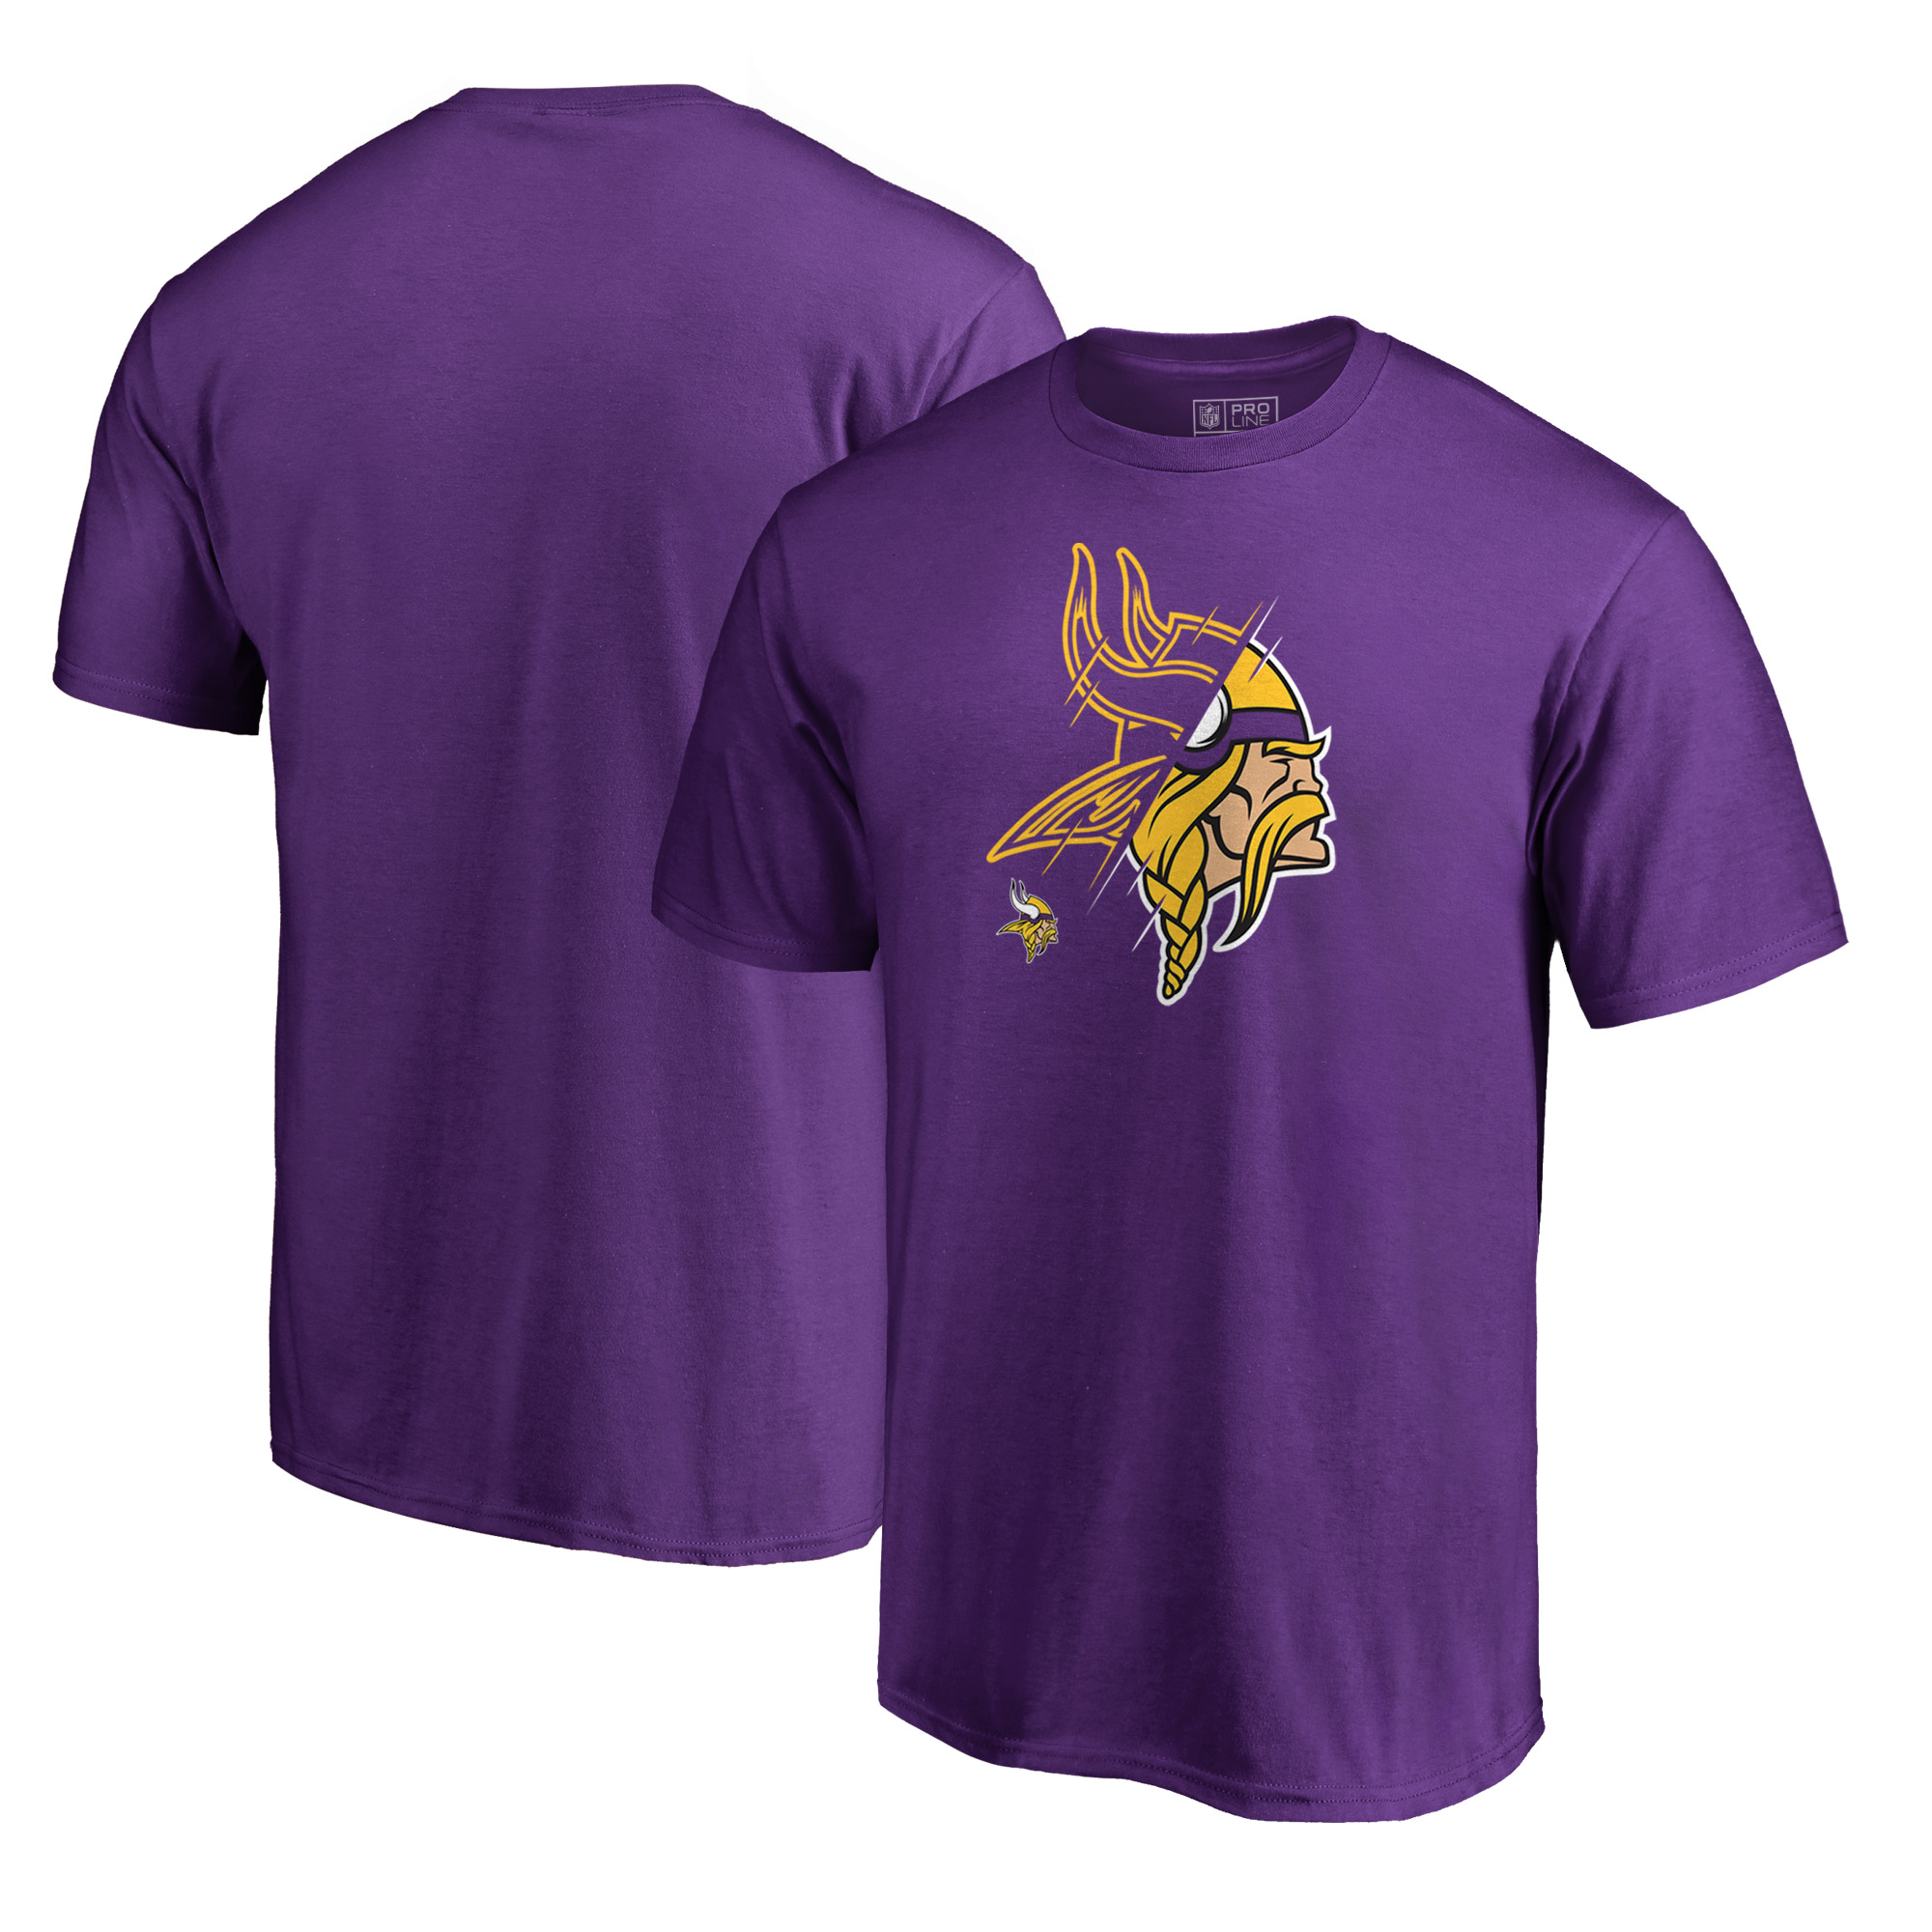 Minnesota Vikings NFL Pro Line by Fanatics Branded X-Ray T-Shirt - Purple